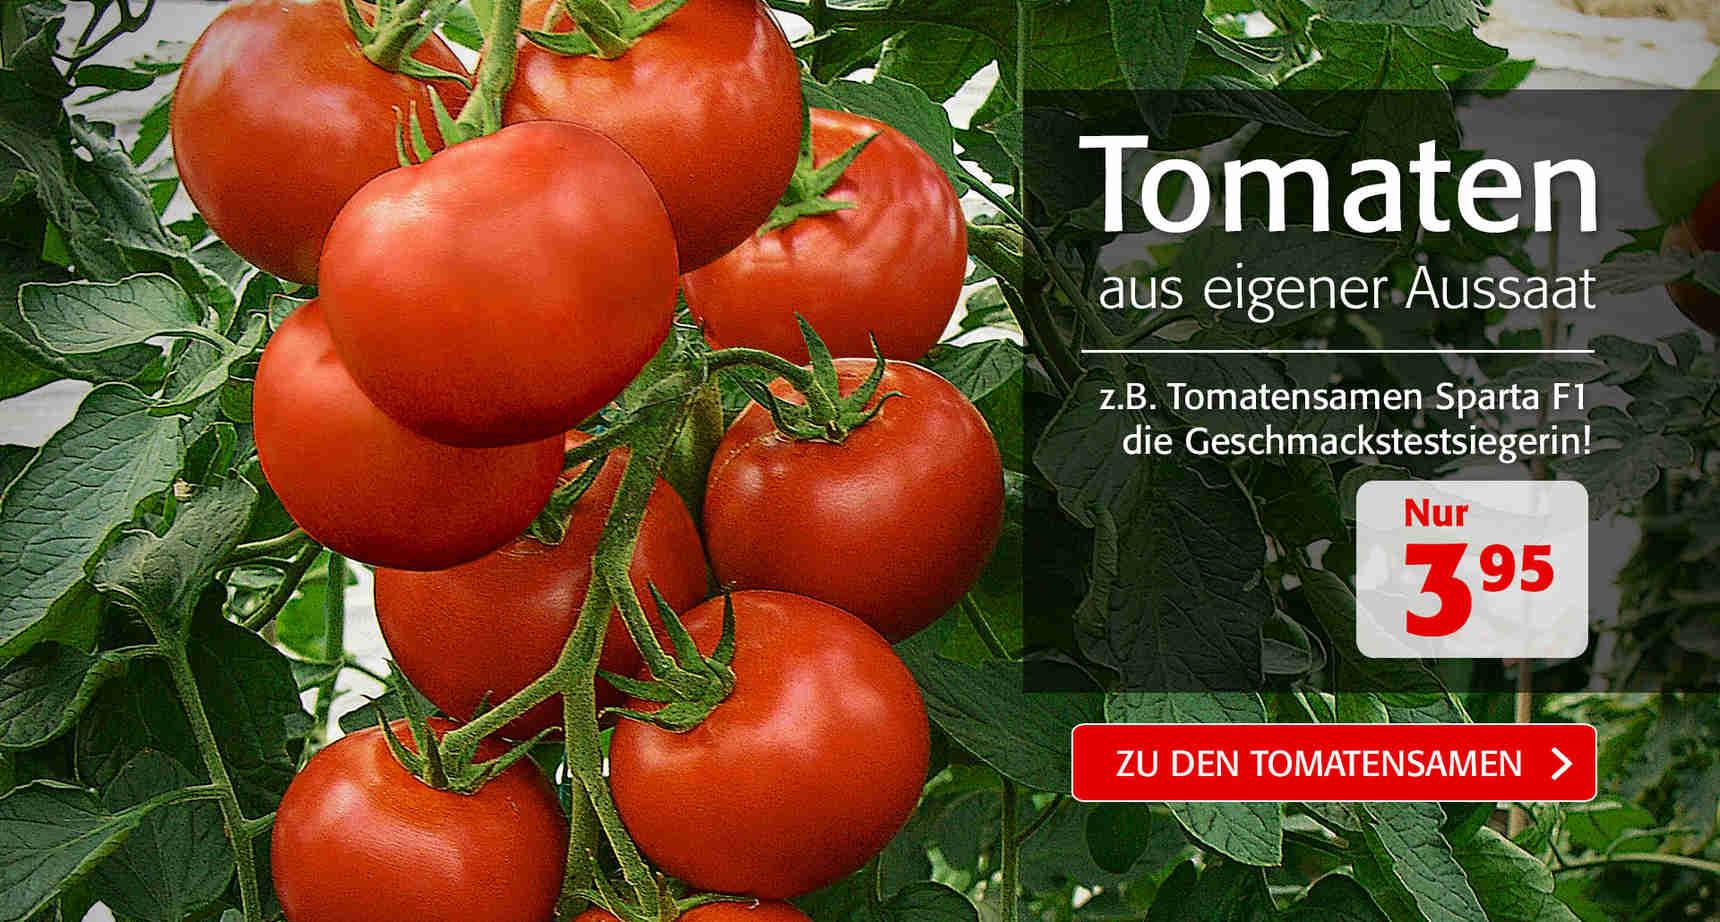 +++ (2) Tomatensamen +++ - 3